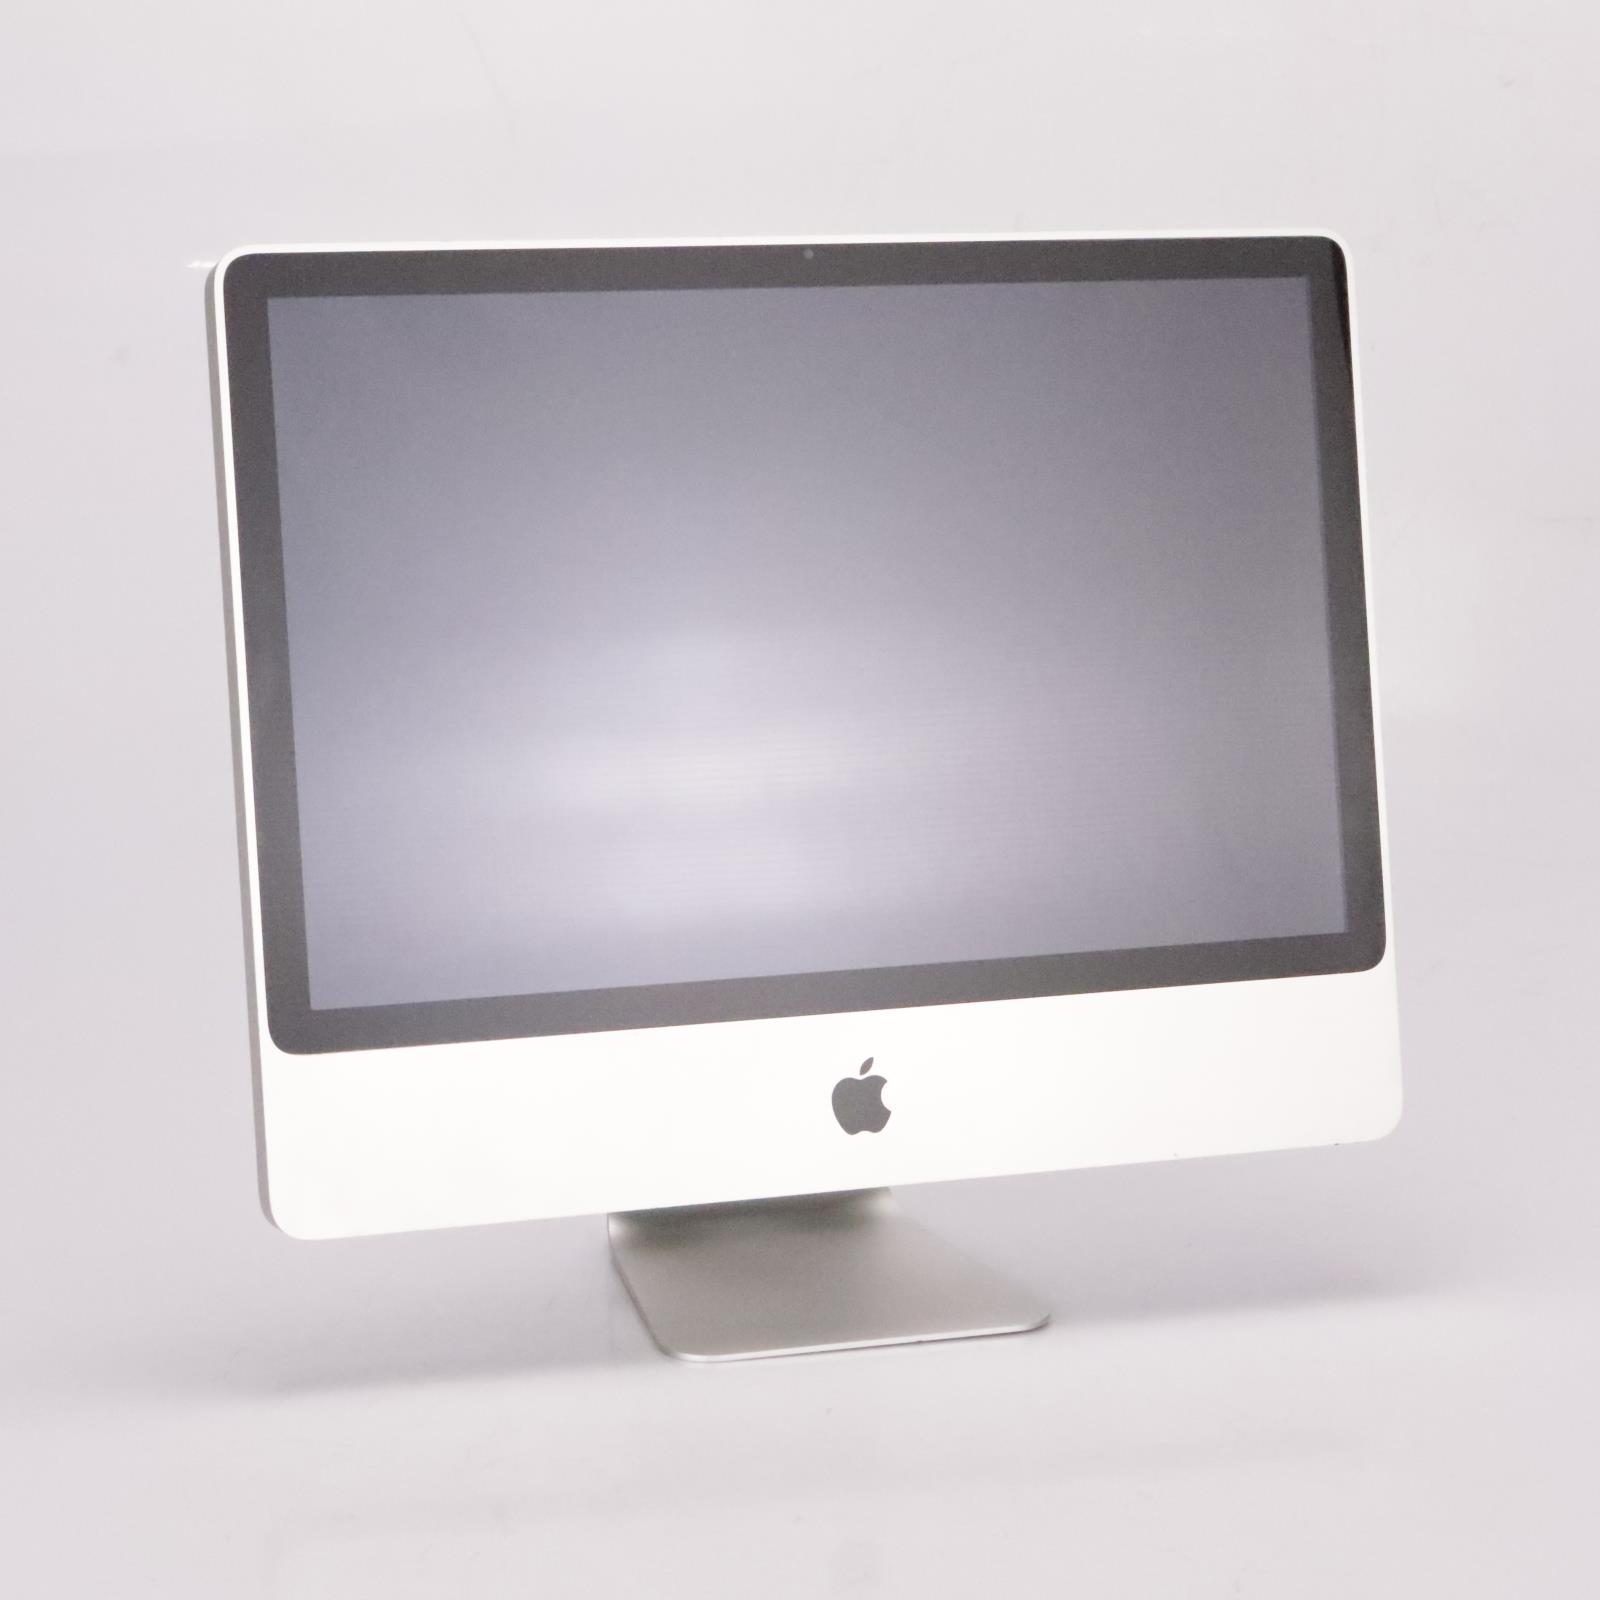 "2009 Apple 24"" iMac 2.93 GHz Intel Core 2 Duo 640GB HD 4GB RAM El Capitan #35167"